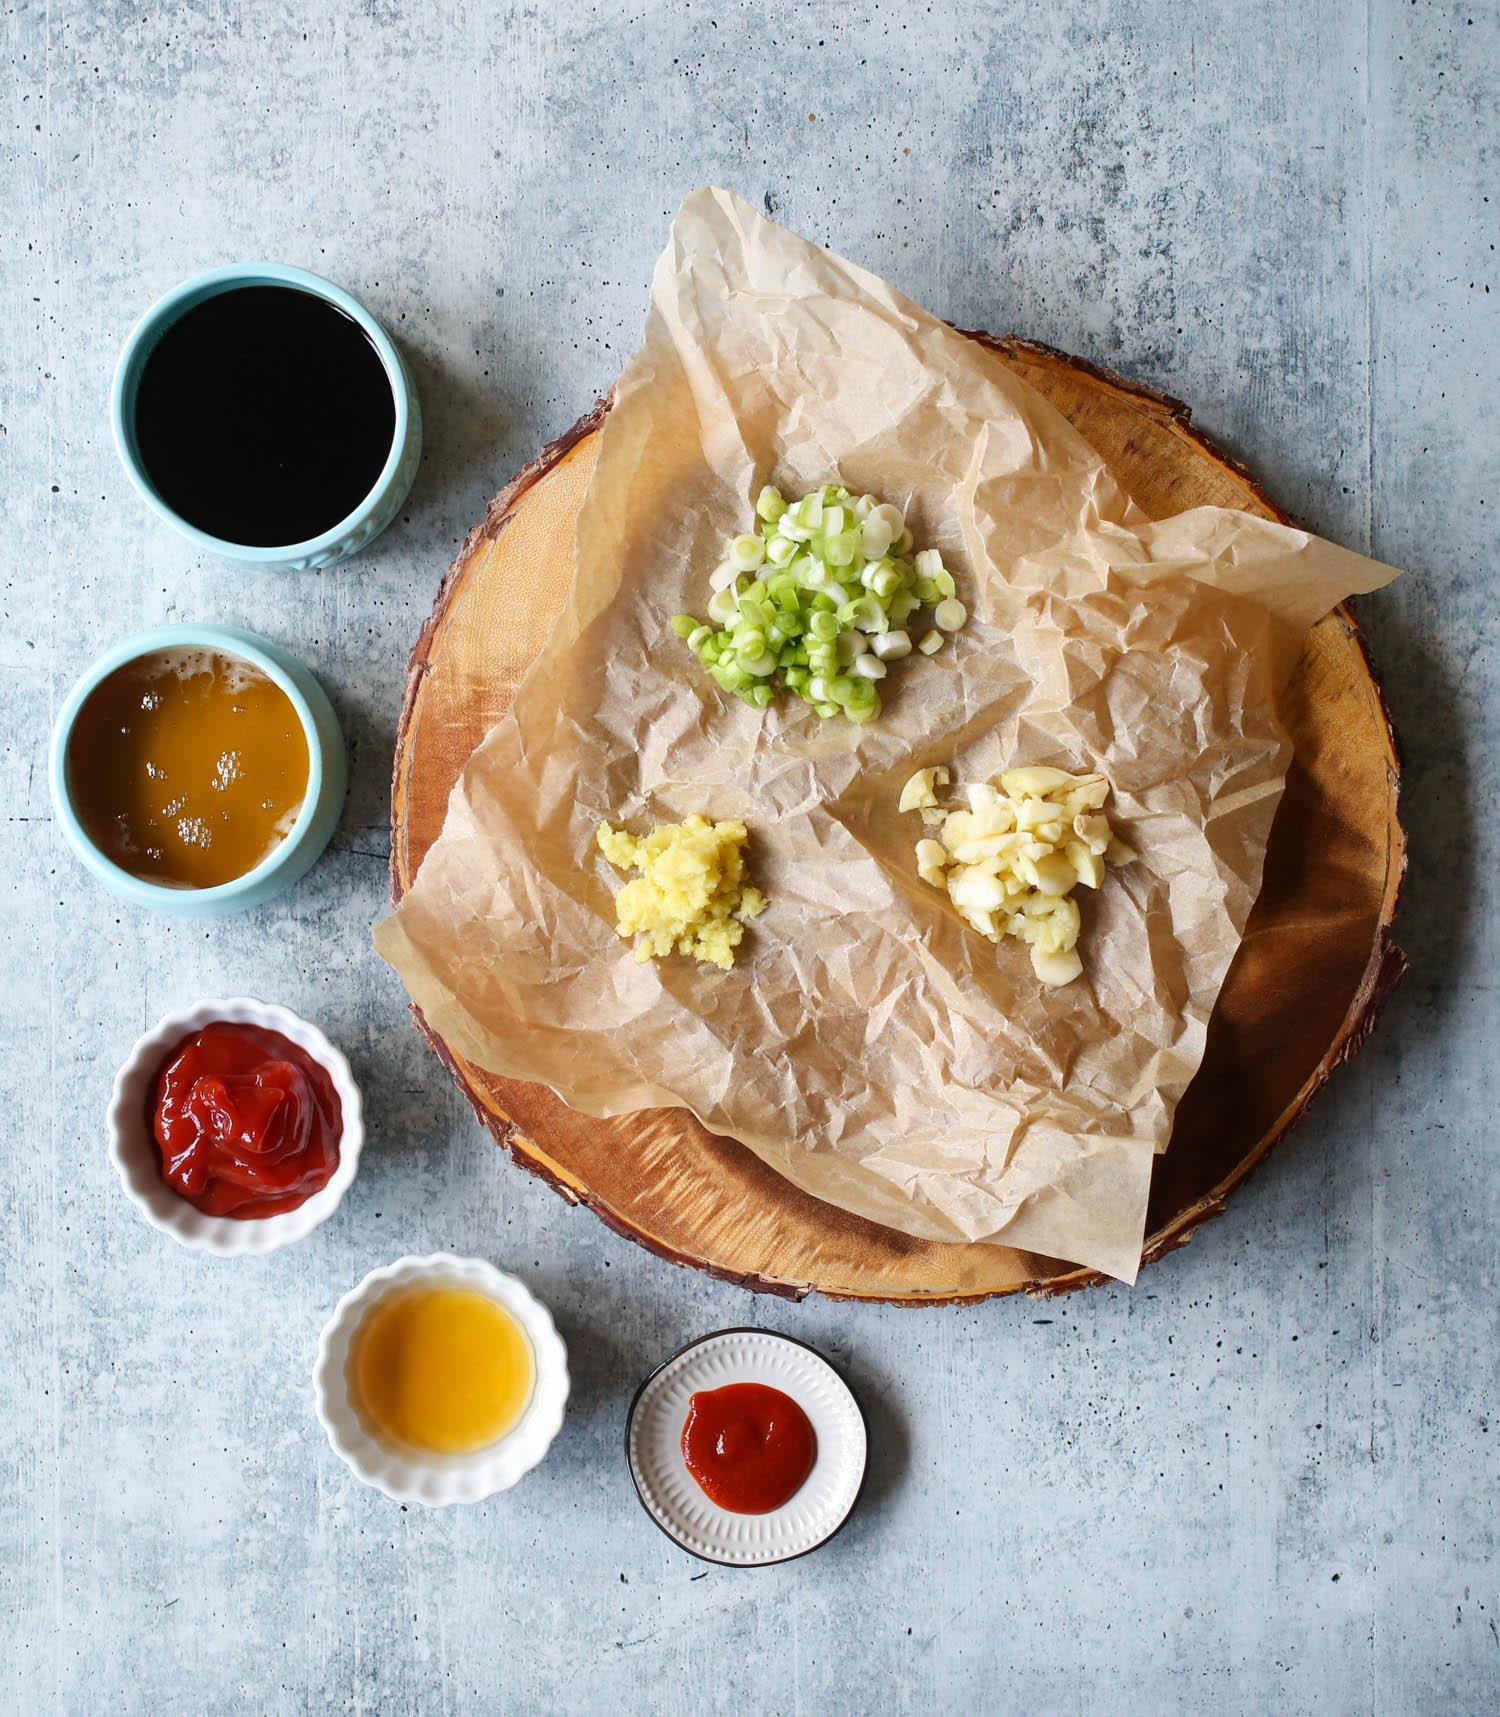 ingredients for Slow Cooker Honey Garlic Chicken